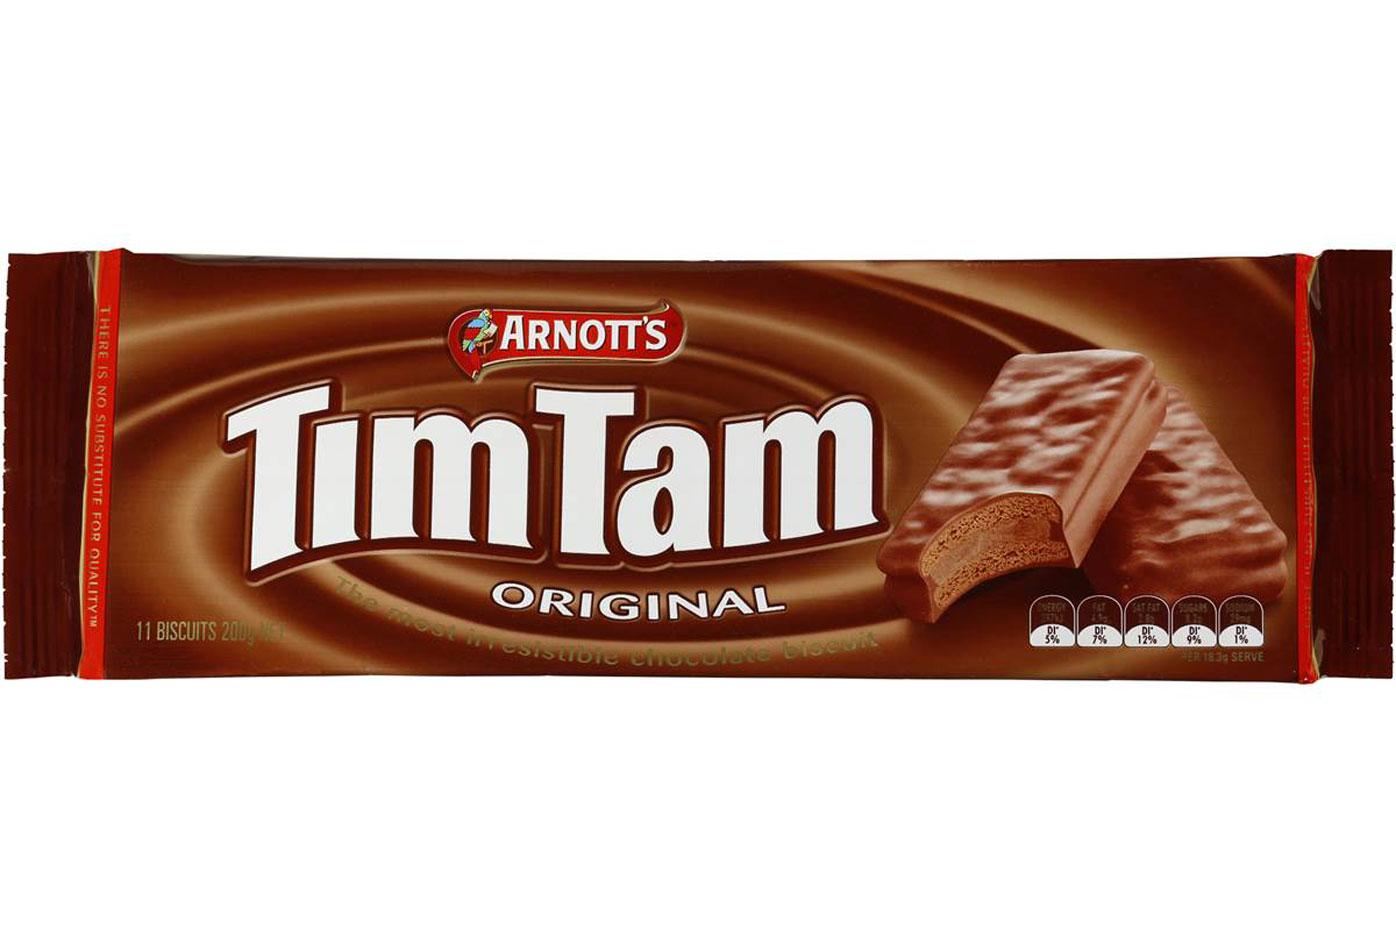 Two Tim Tams: 16.4g sugar